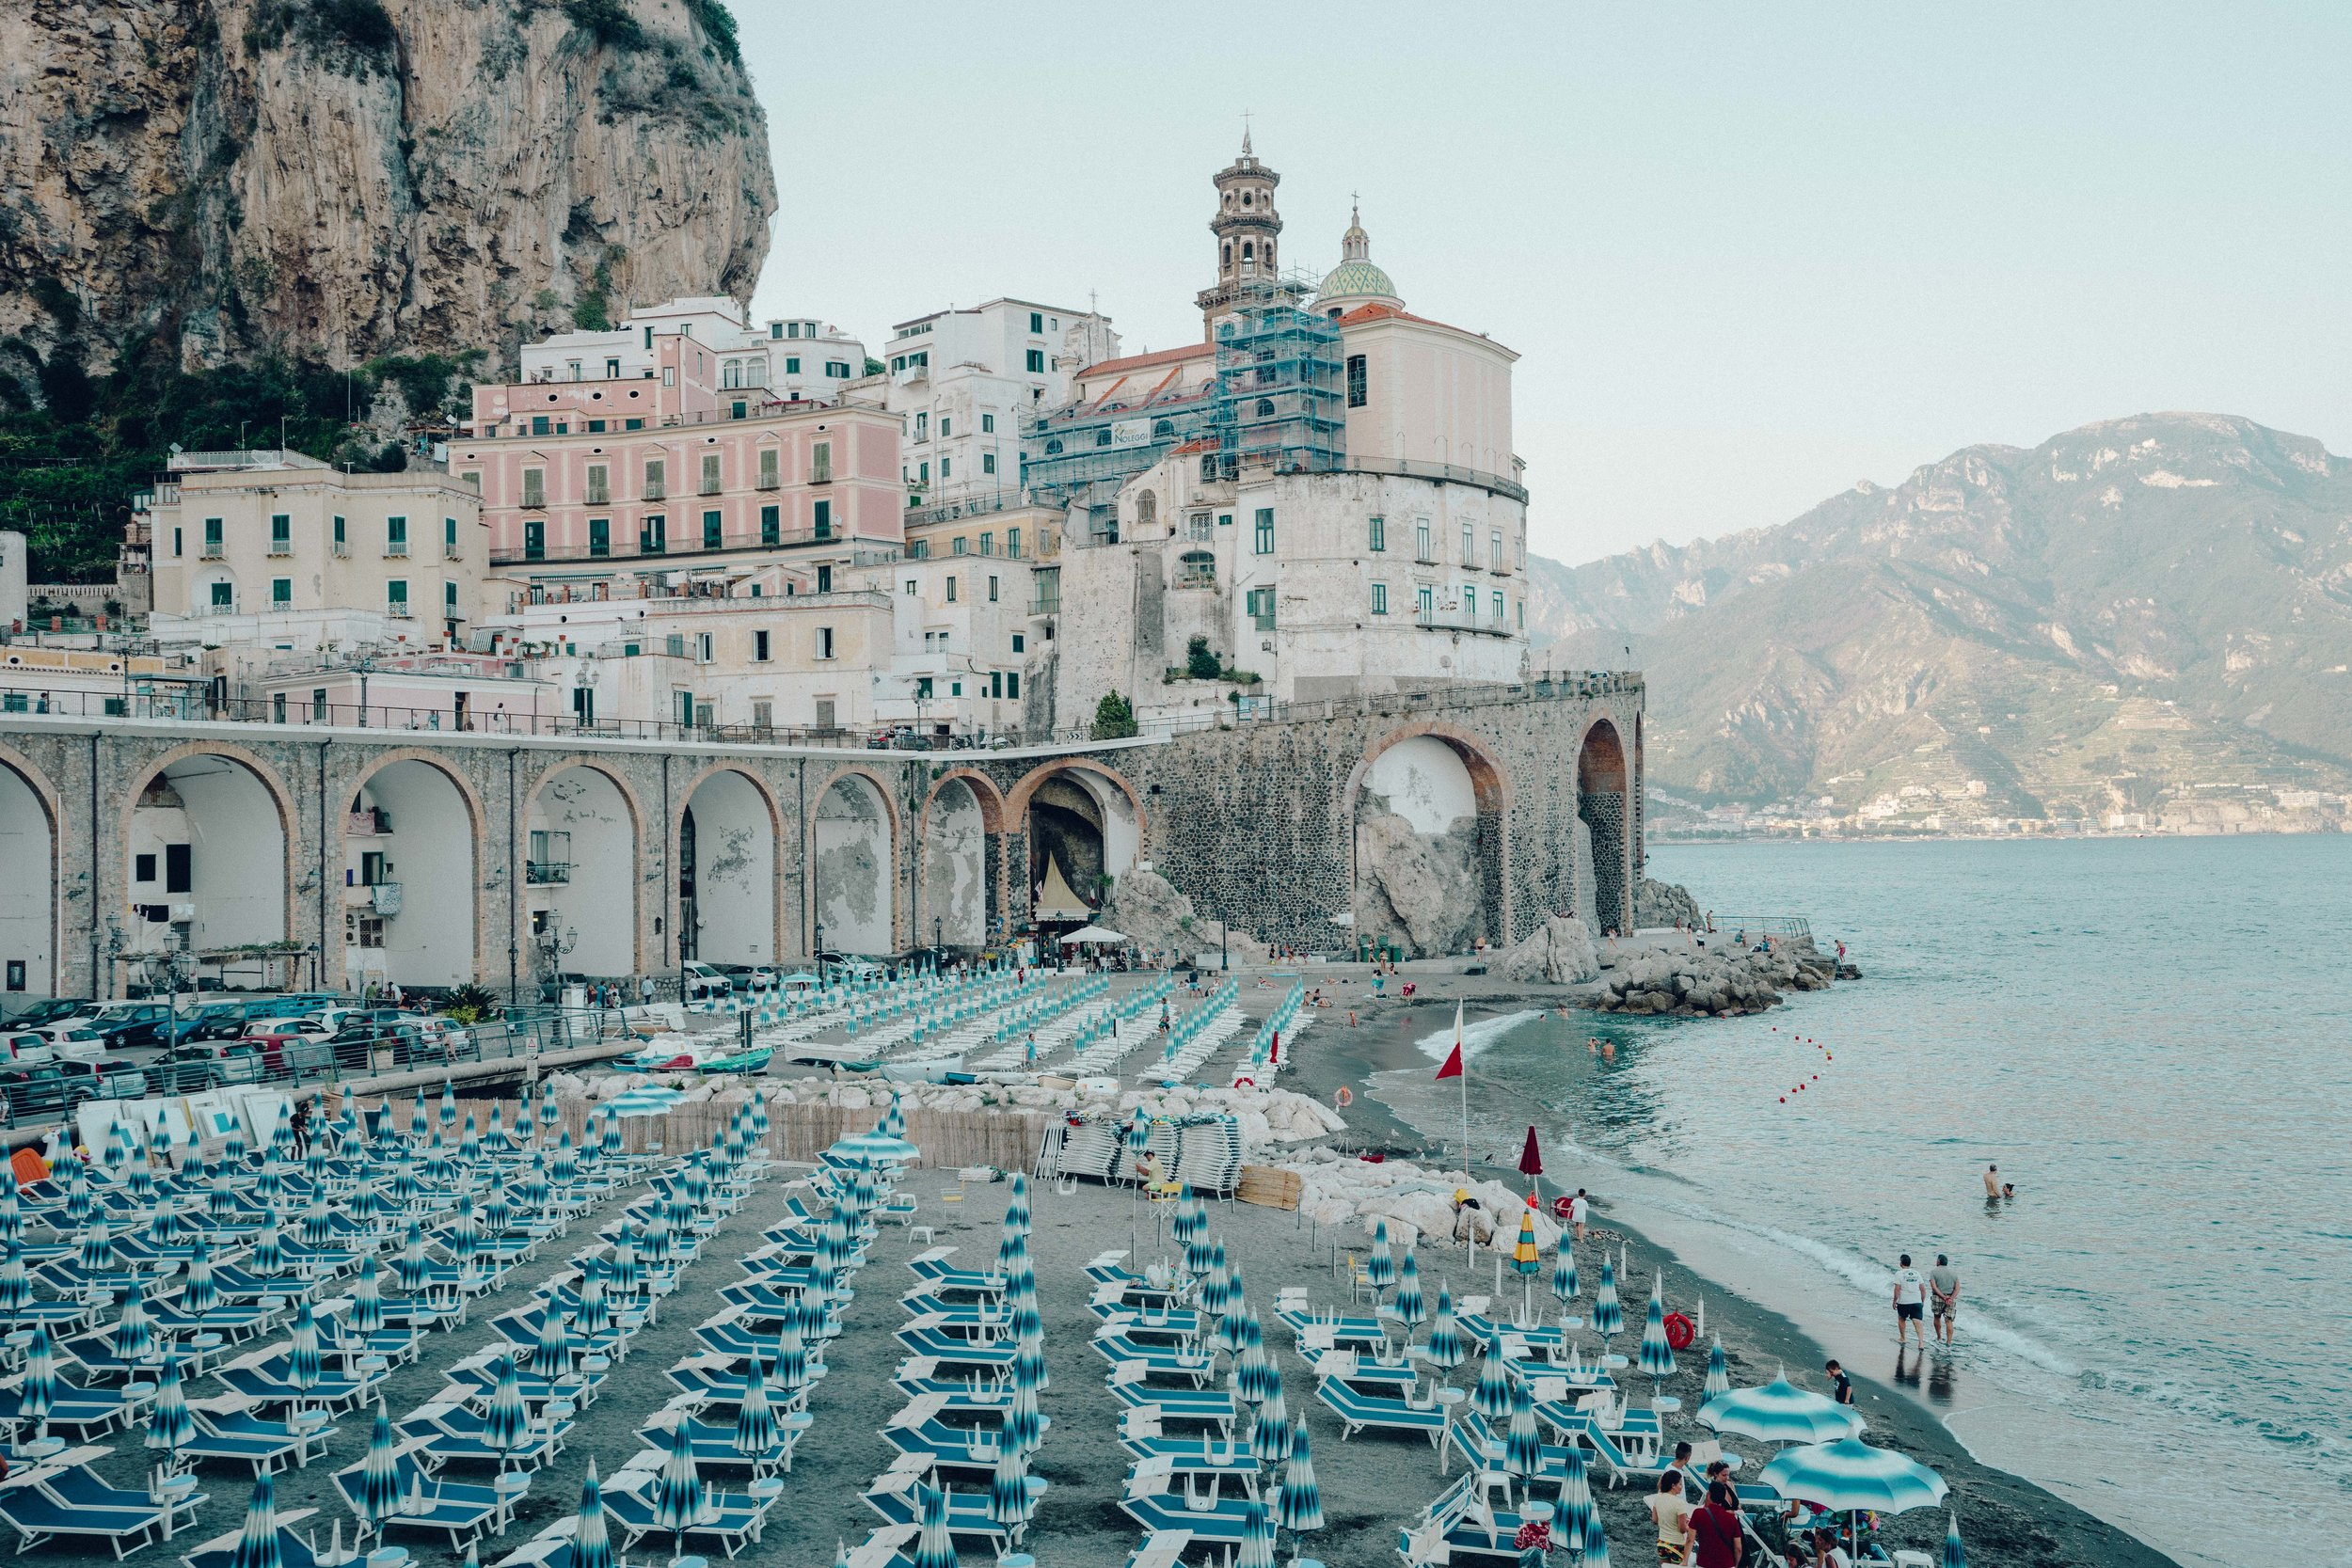 ASROSENVINGE_Roadtrip_Italy_Puglia_Amalfi-07616.jpg